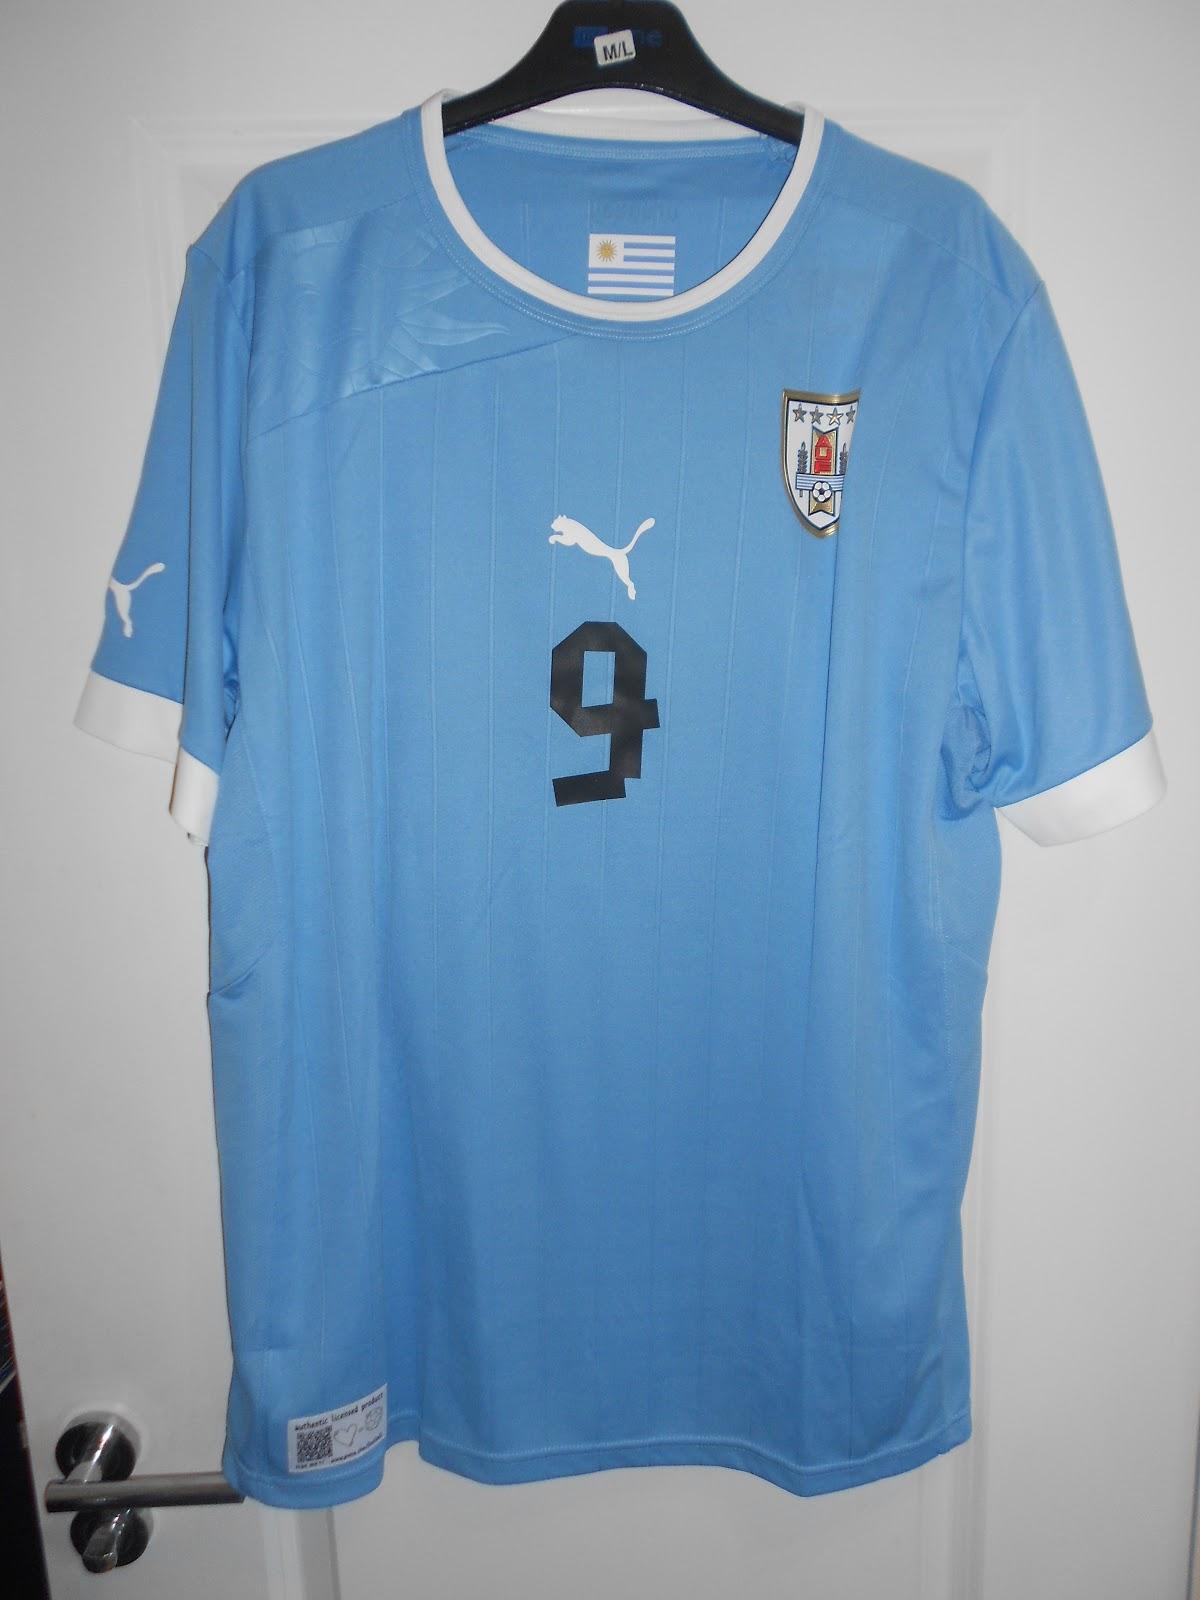 1f3caa668cf My collection of football shirts: Uruguay Home 2011